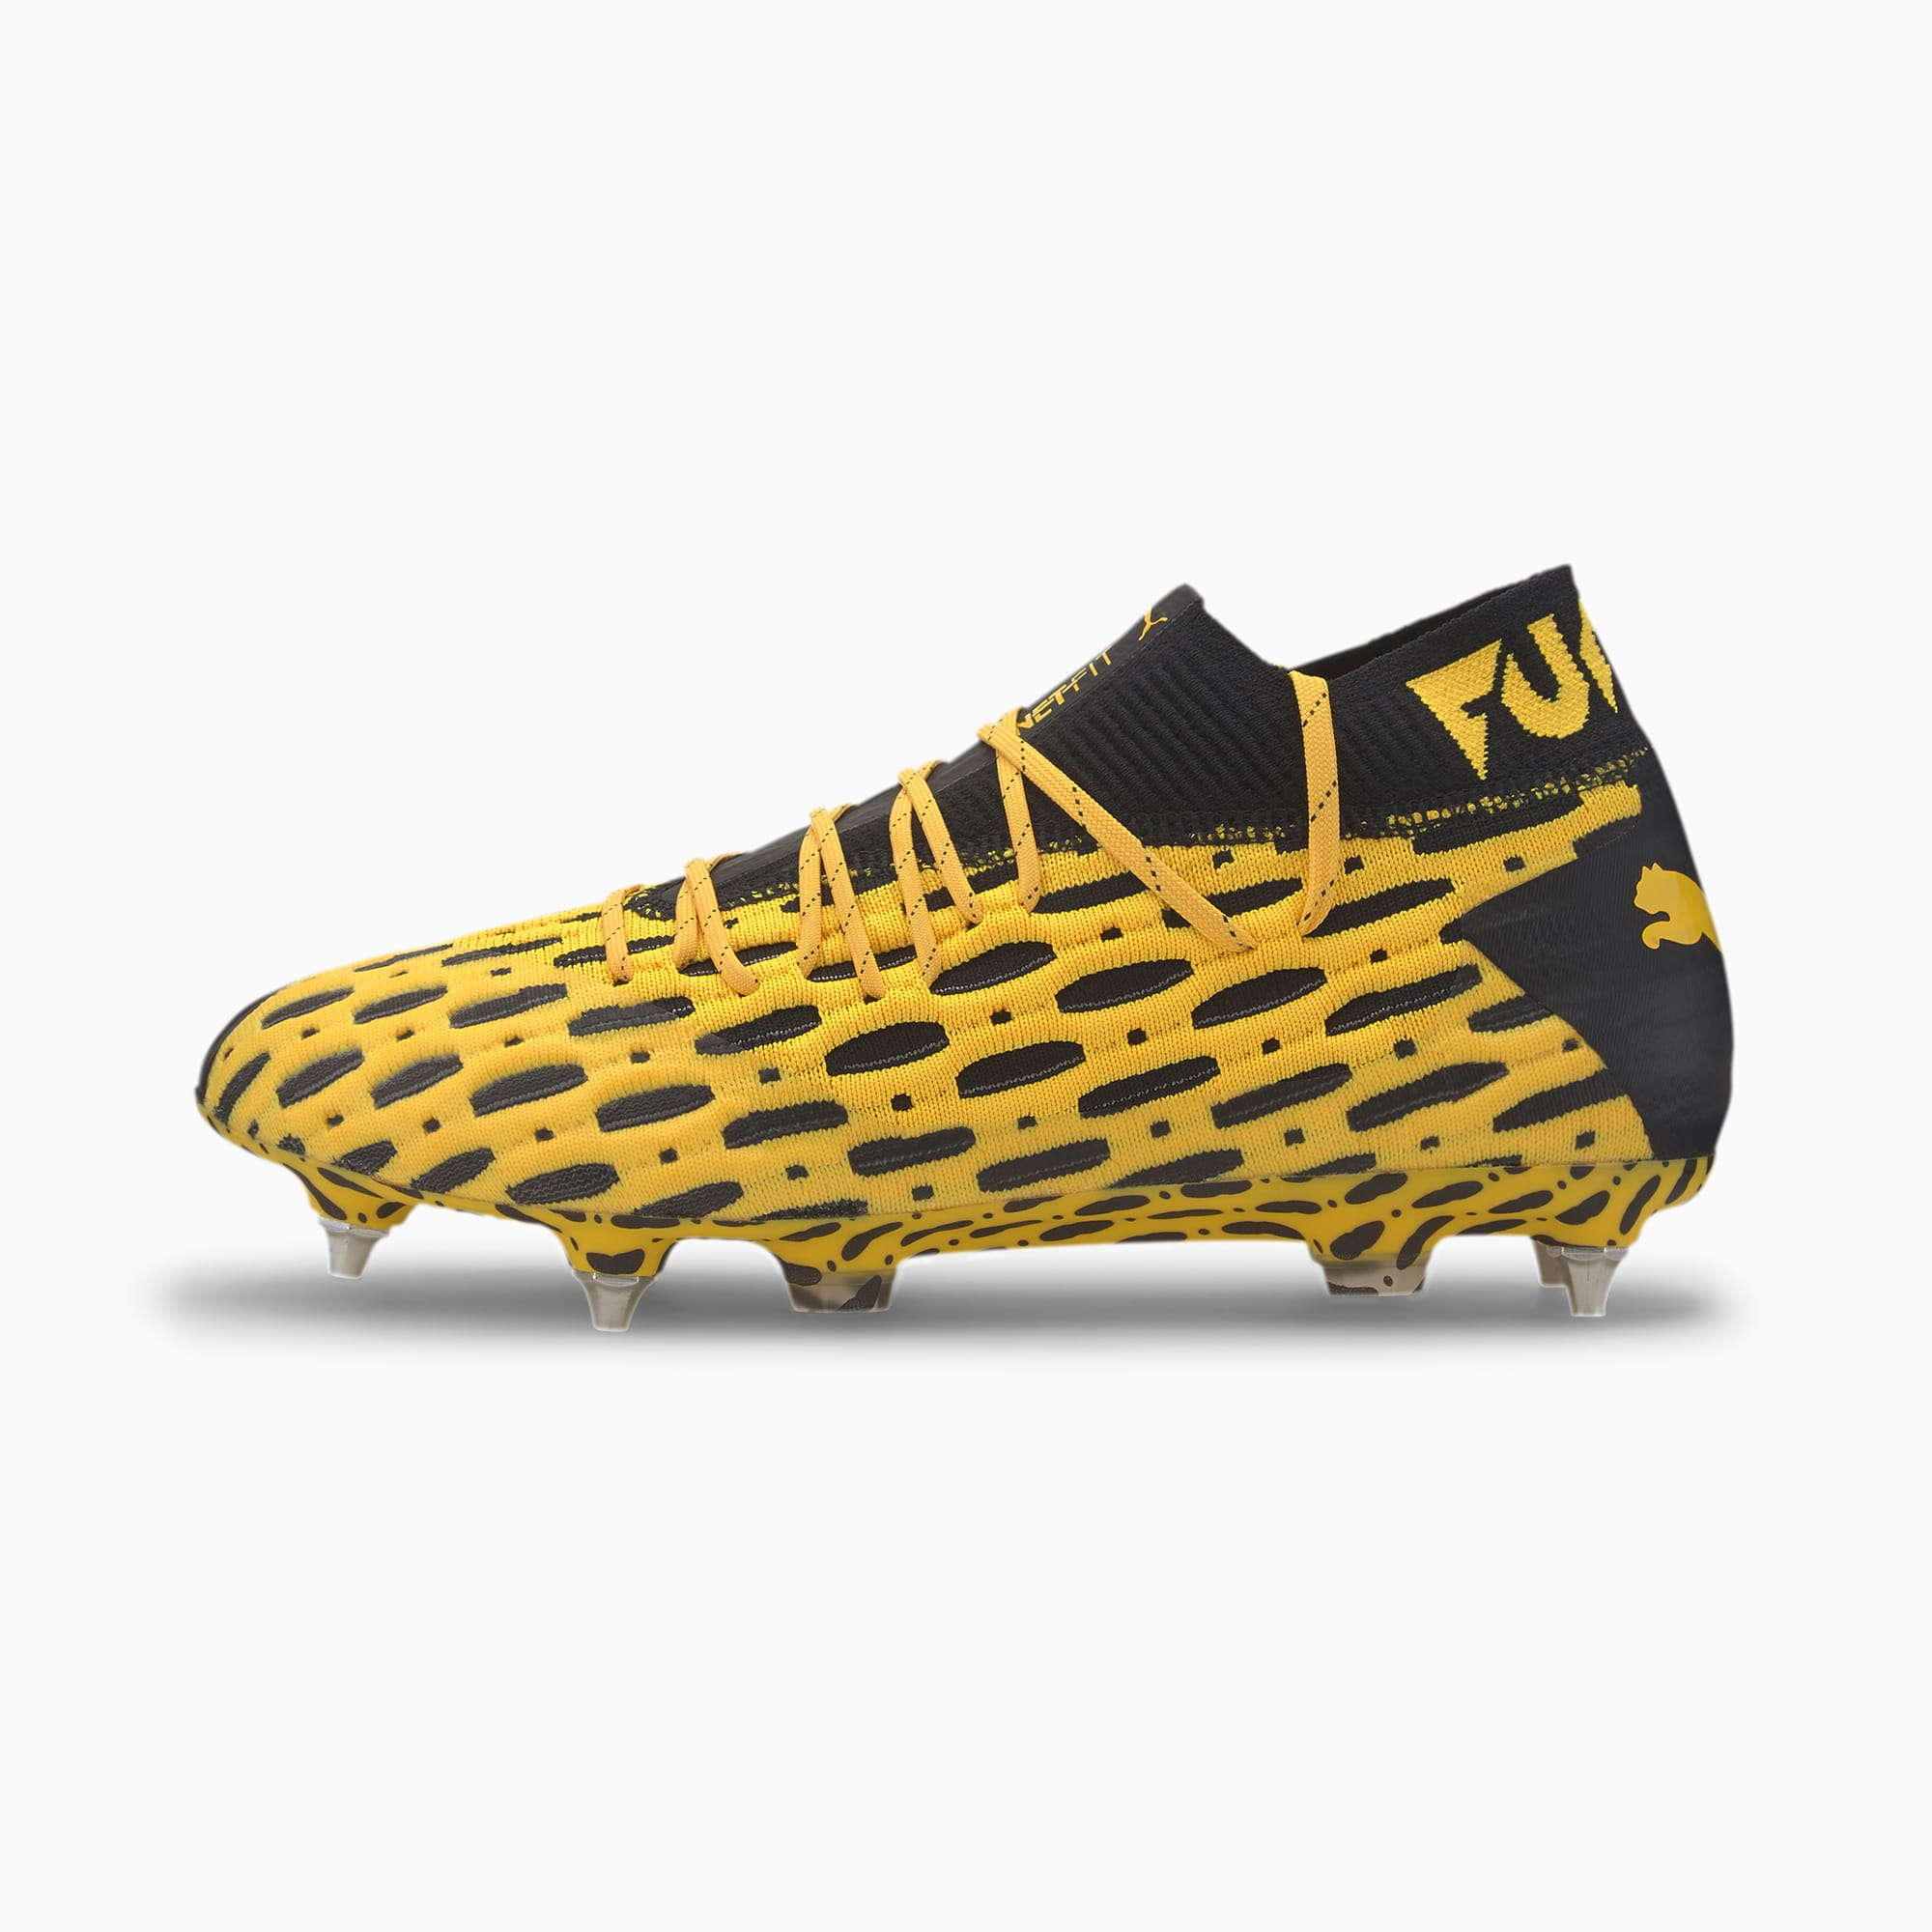 FUTURE 5.1 NETFIT MxSG Football Boots